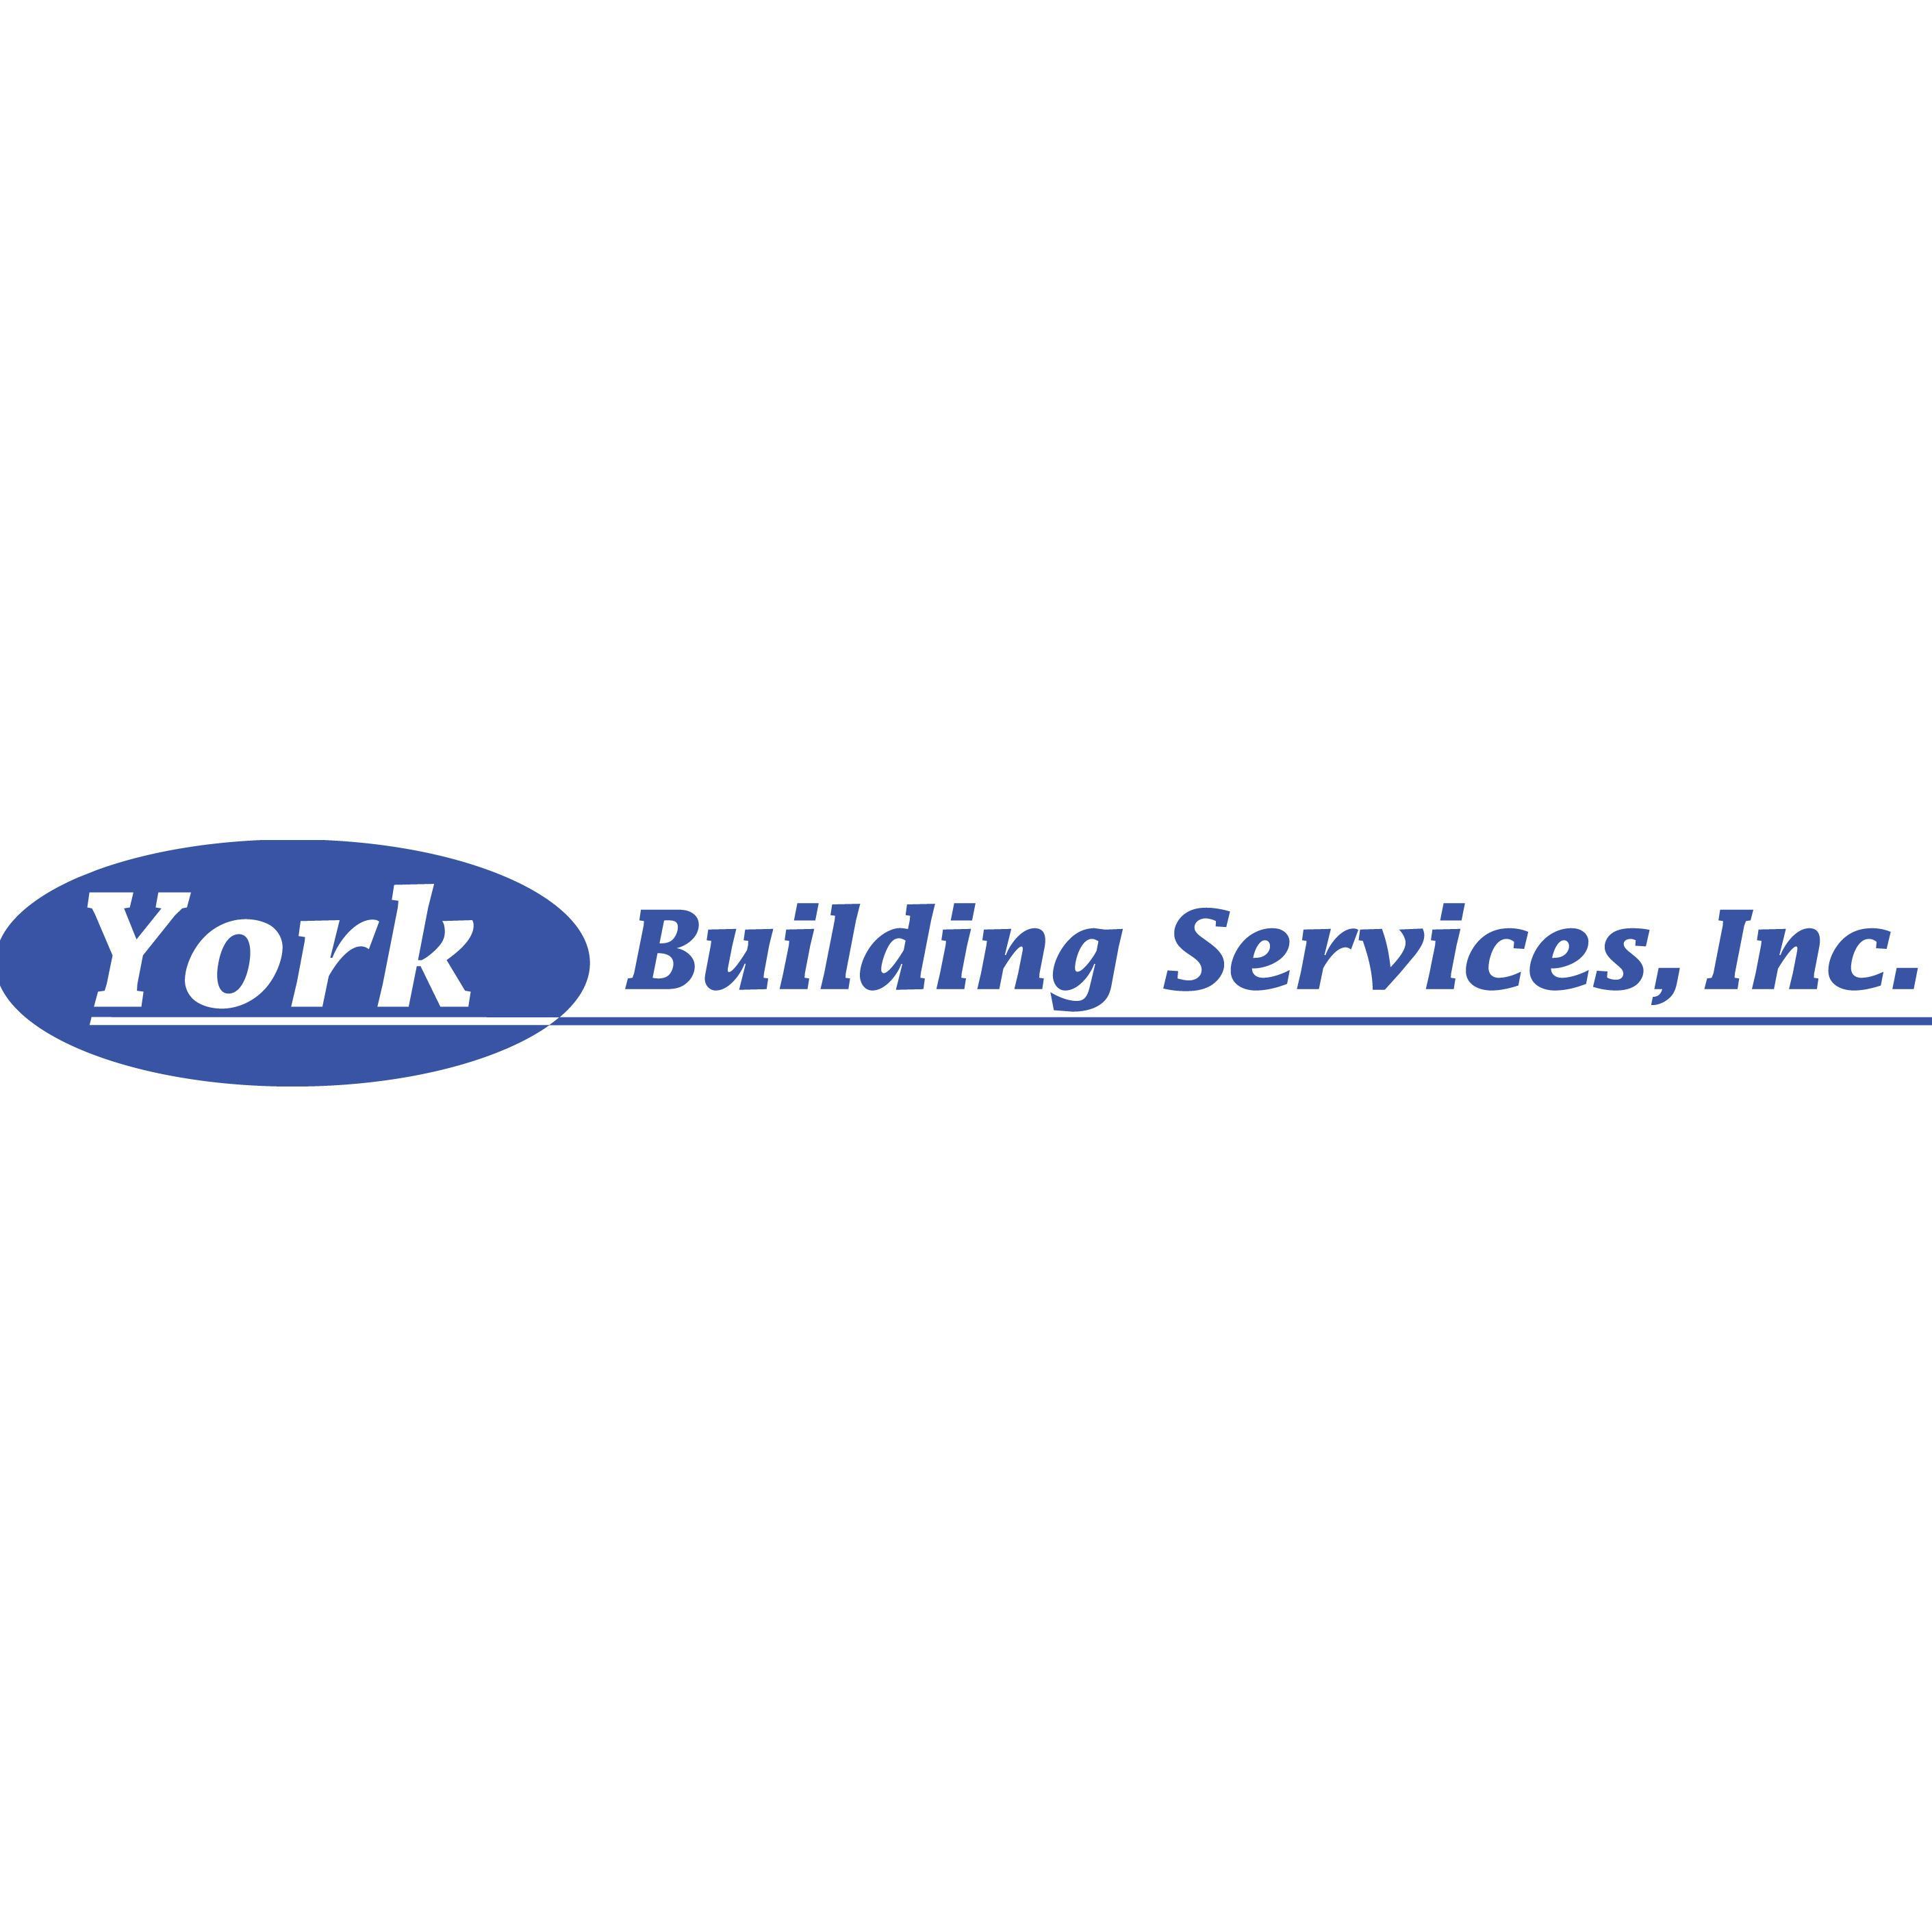 York Building Services Inc.